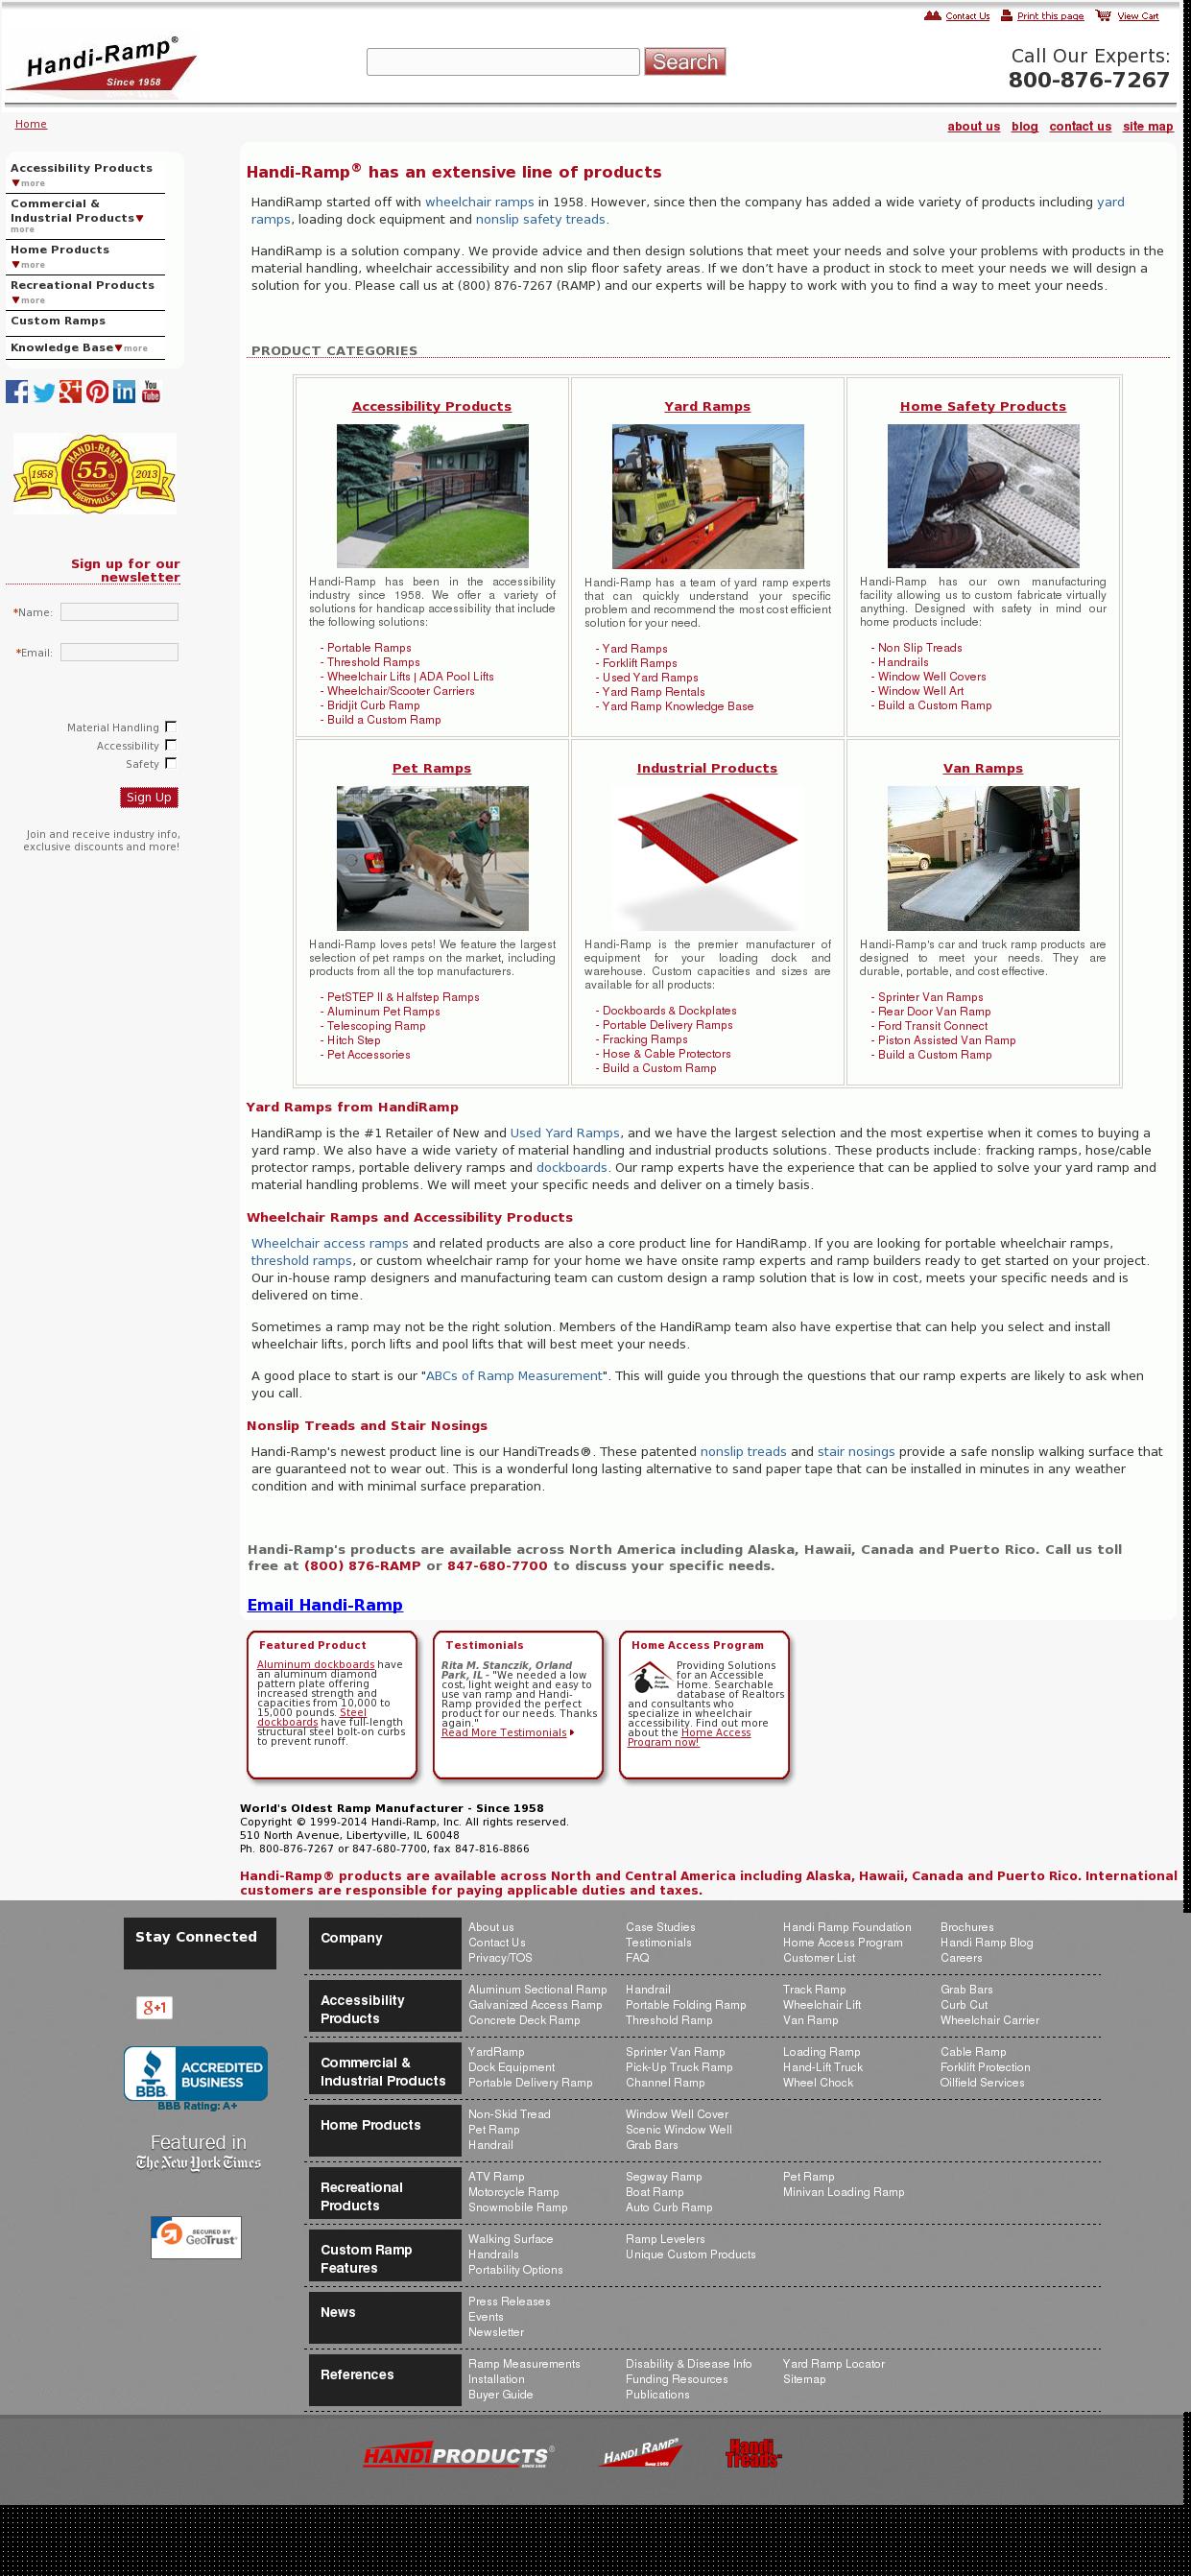 Handi-Ramp Competitors, Revenue and Employees - Owler